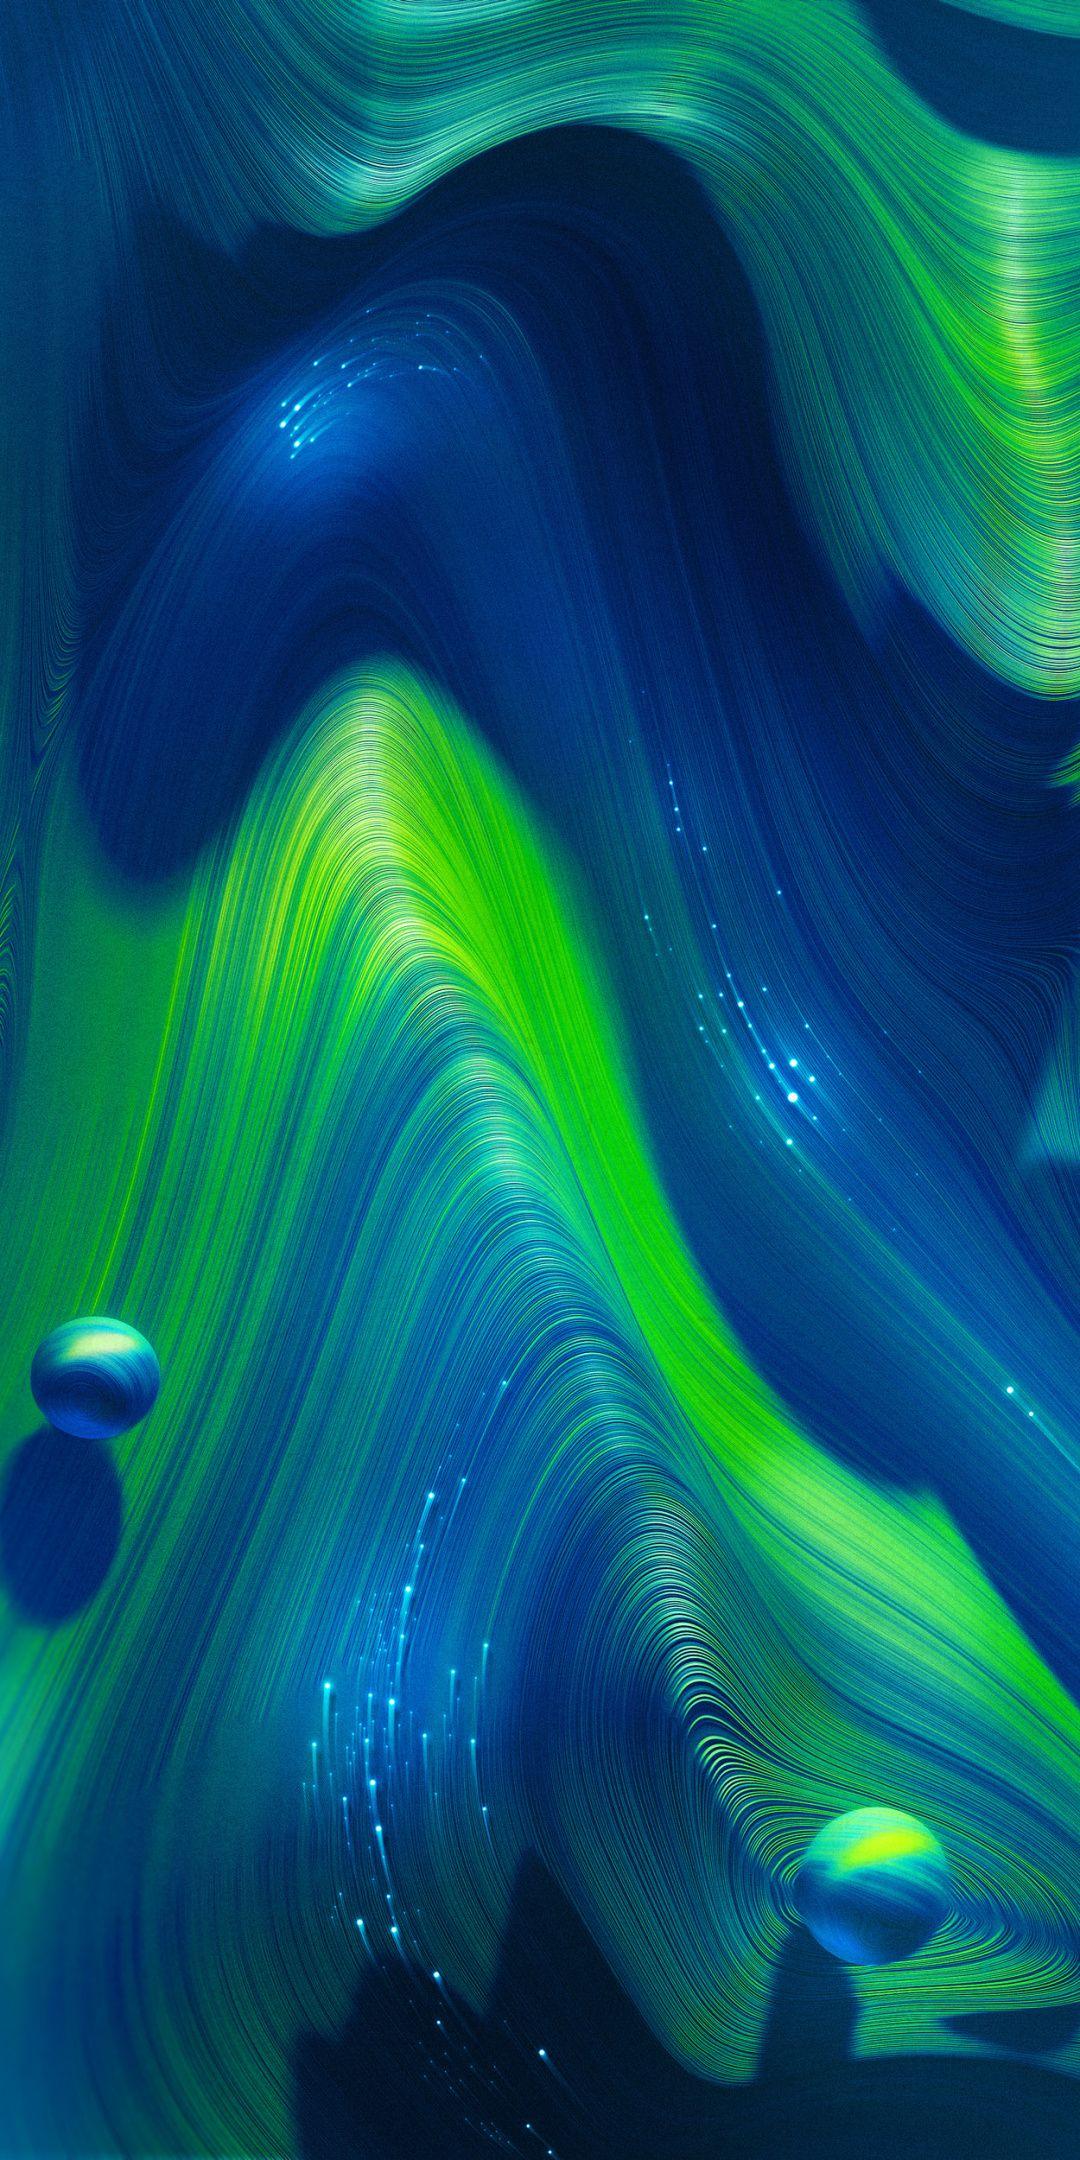 Waves Flow Stream Colorful Blue Green 1080x2160 Wallpaper Xiaomi Wallpapers Galaxy Phone Wallpaper Cellphone Wallpaper Backgrounds